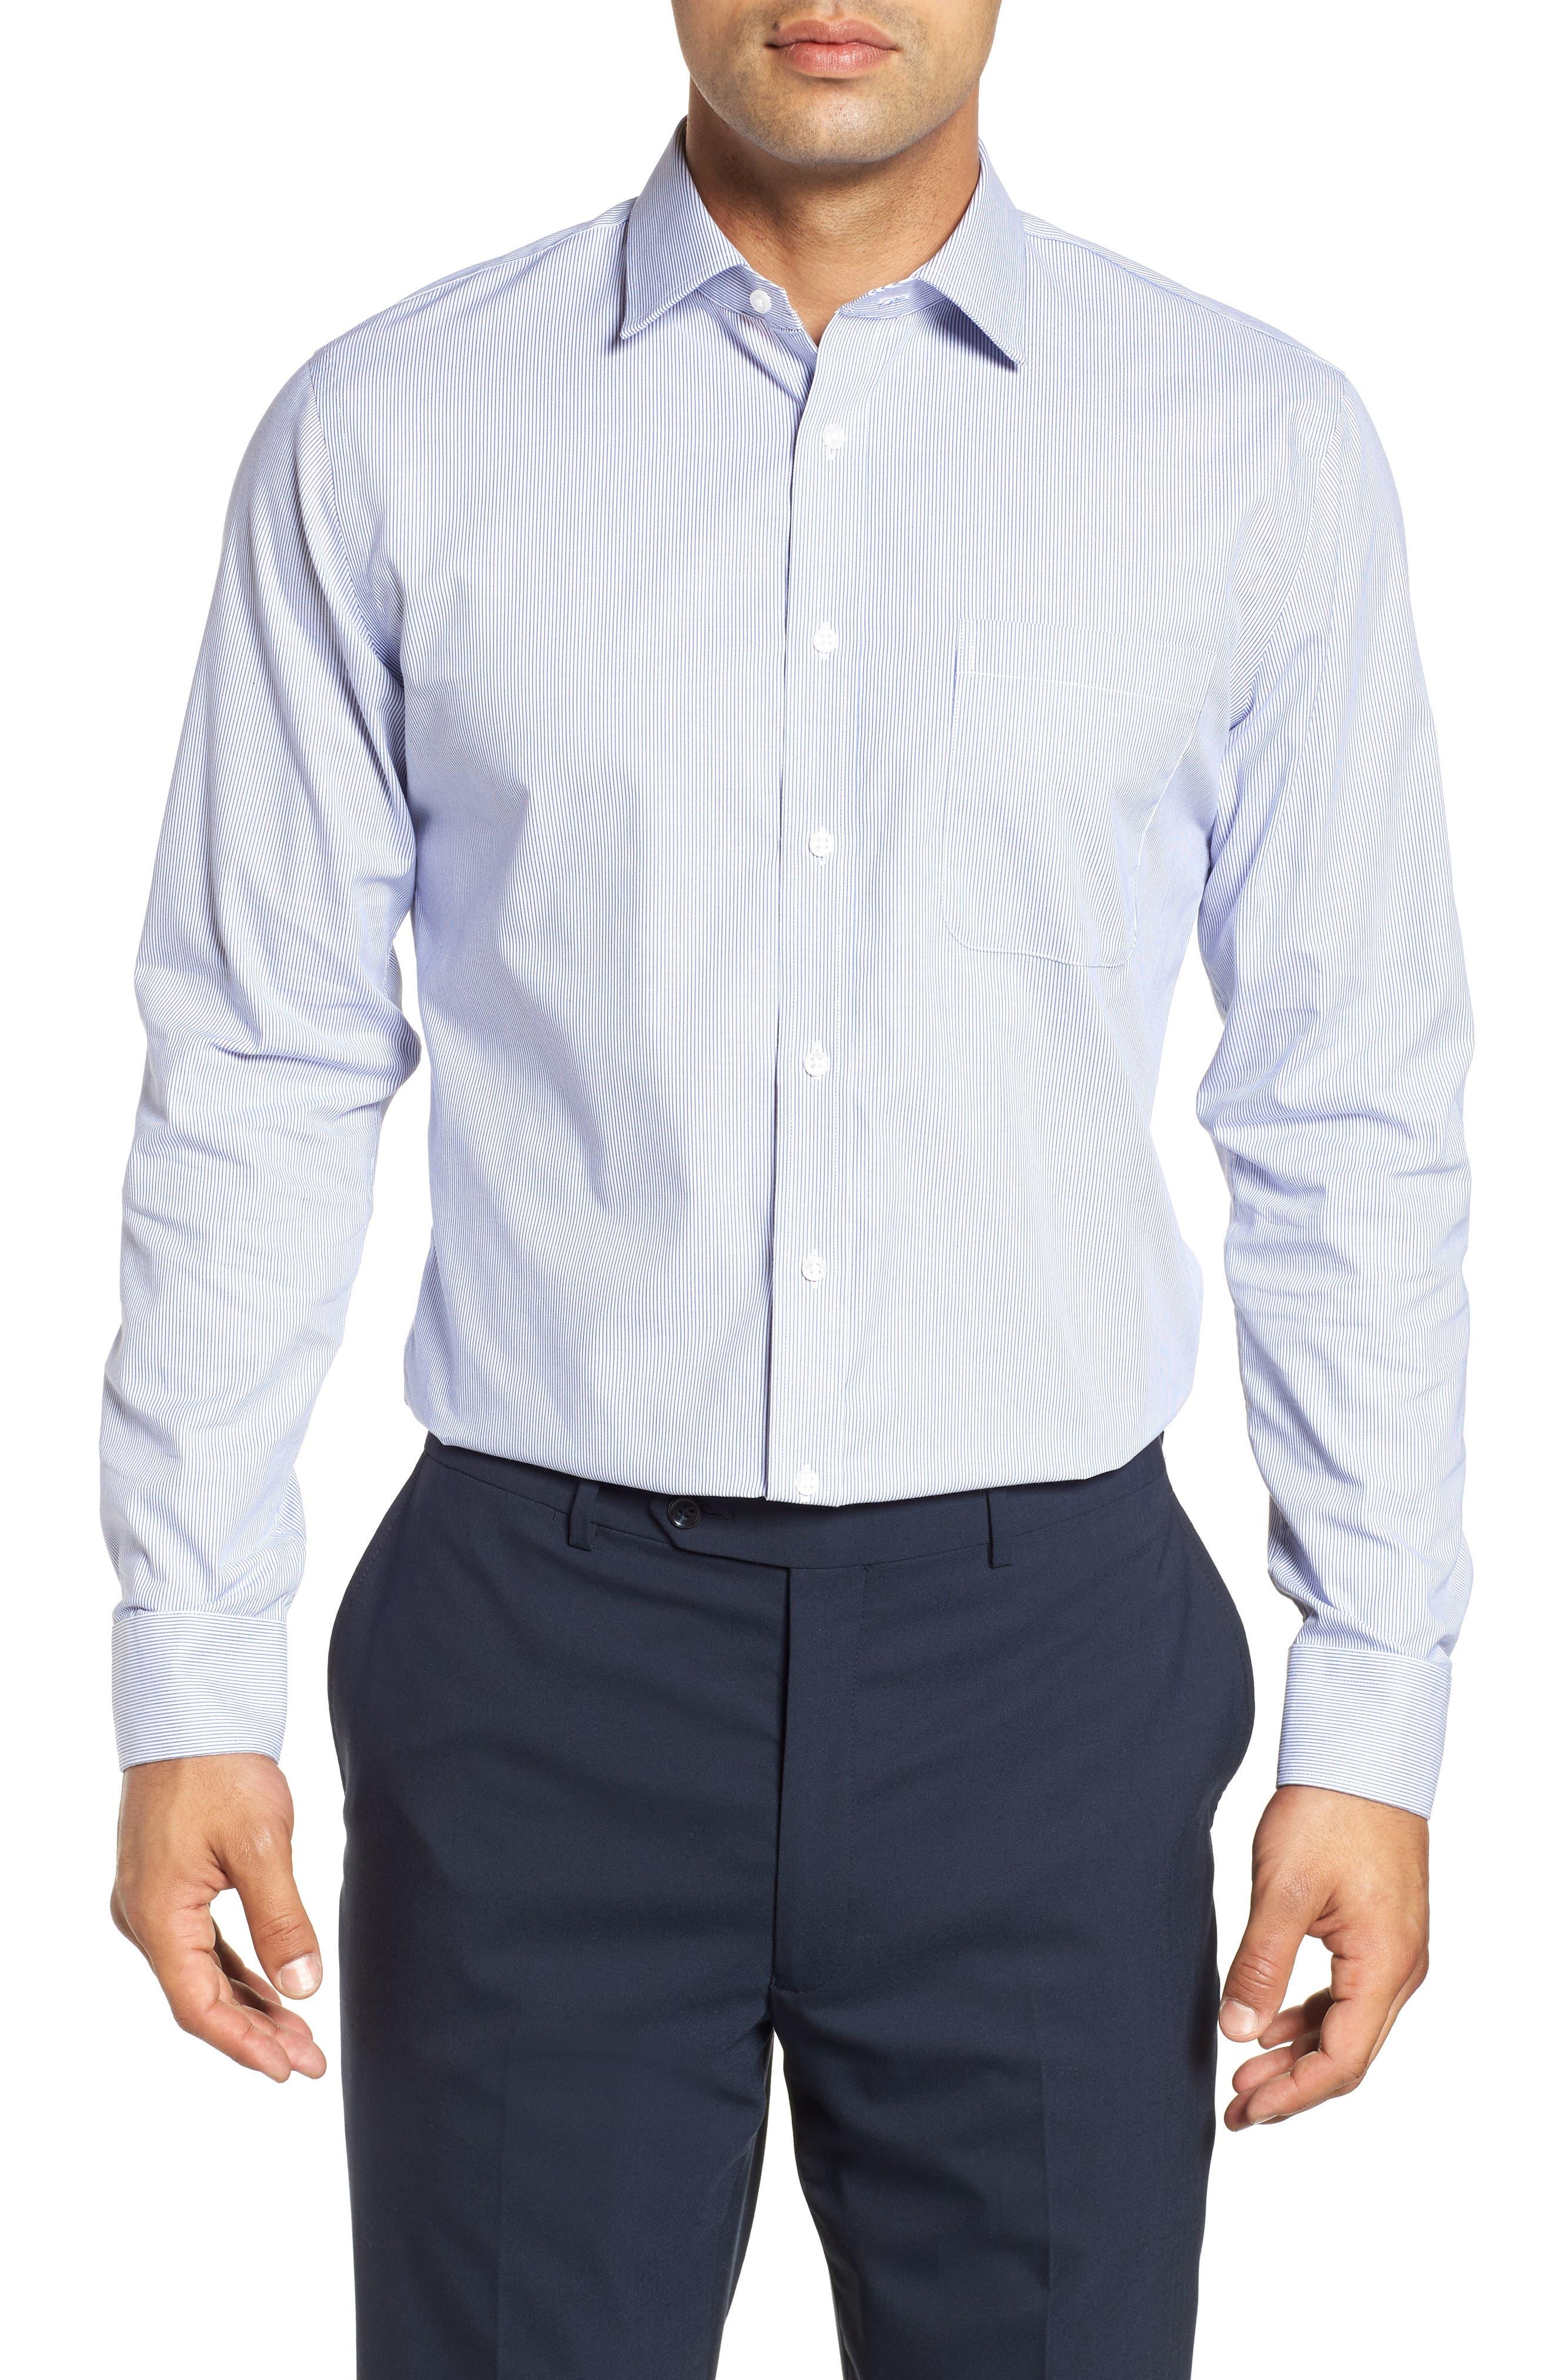 Trim Fit Non-Iron Stripe Dress Shirt,                             Main thumbnail 1, color,                             NAVY PATRIOT